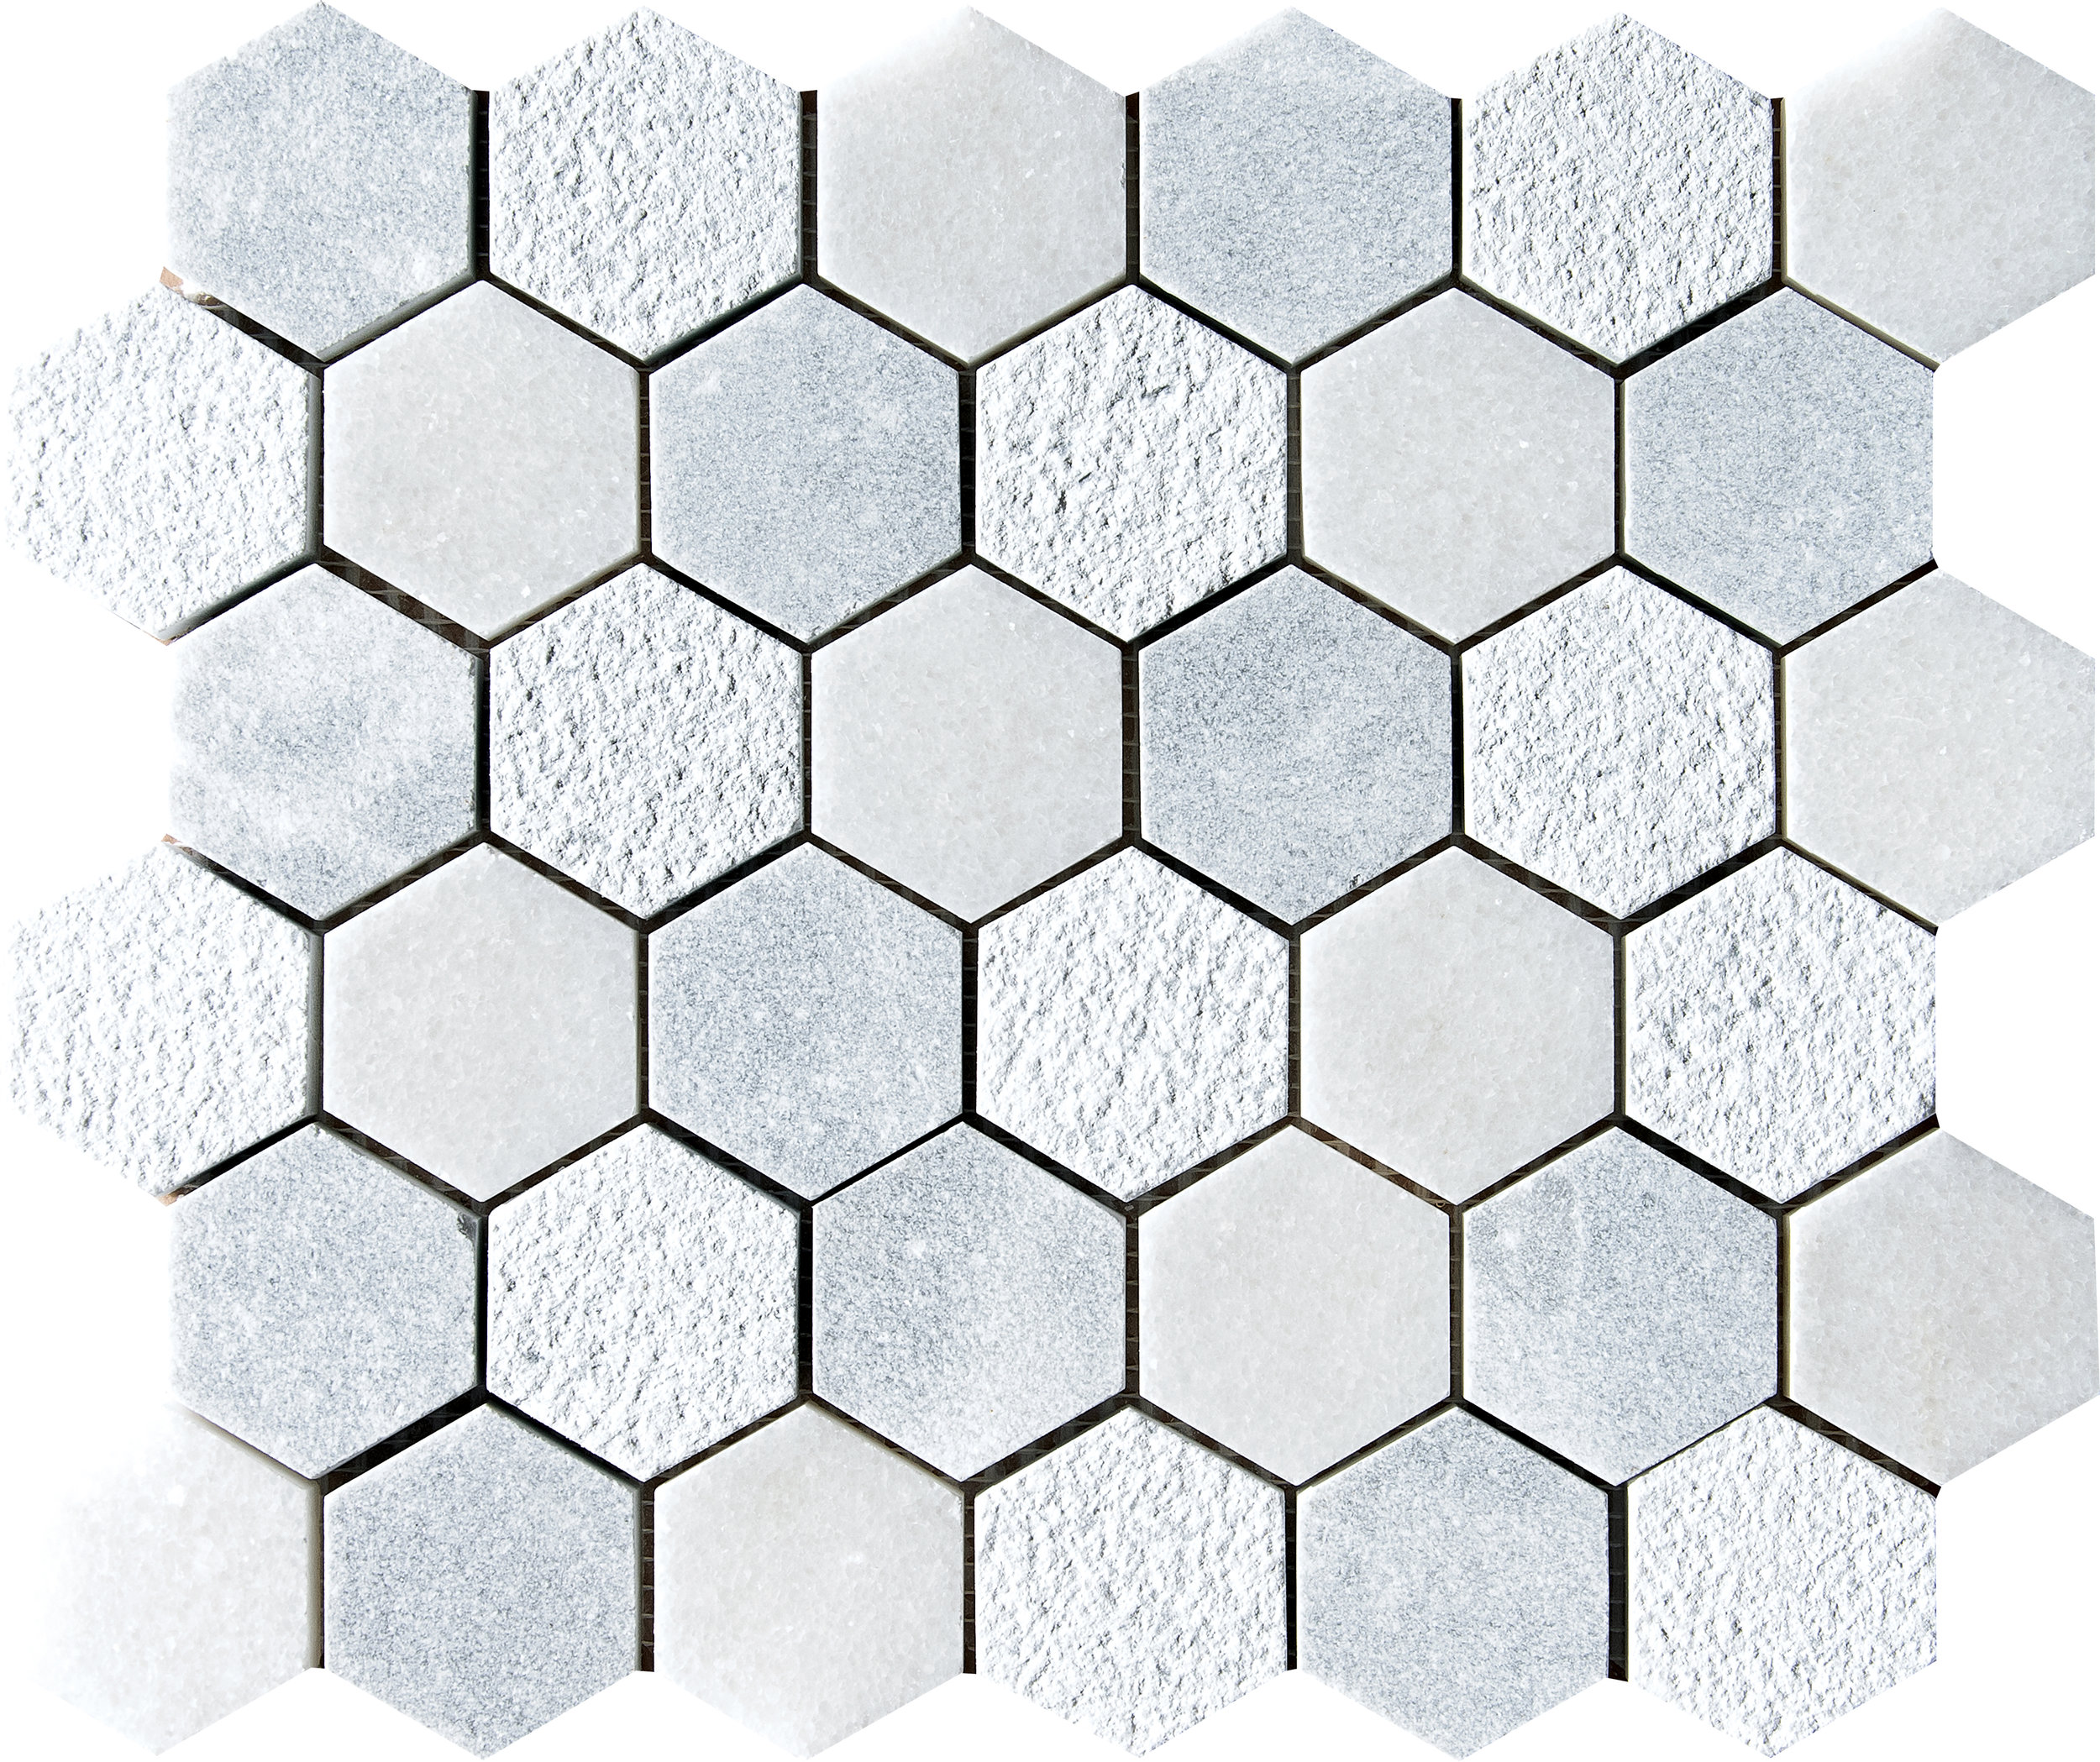 "MS01287 allure & glacier full hexagon textured mosaic 10 3/8""x12""x3/8"" sheets"